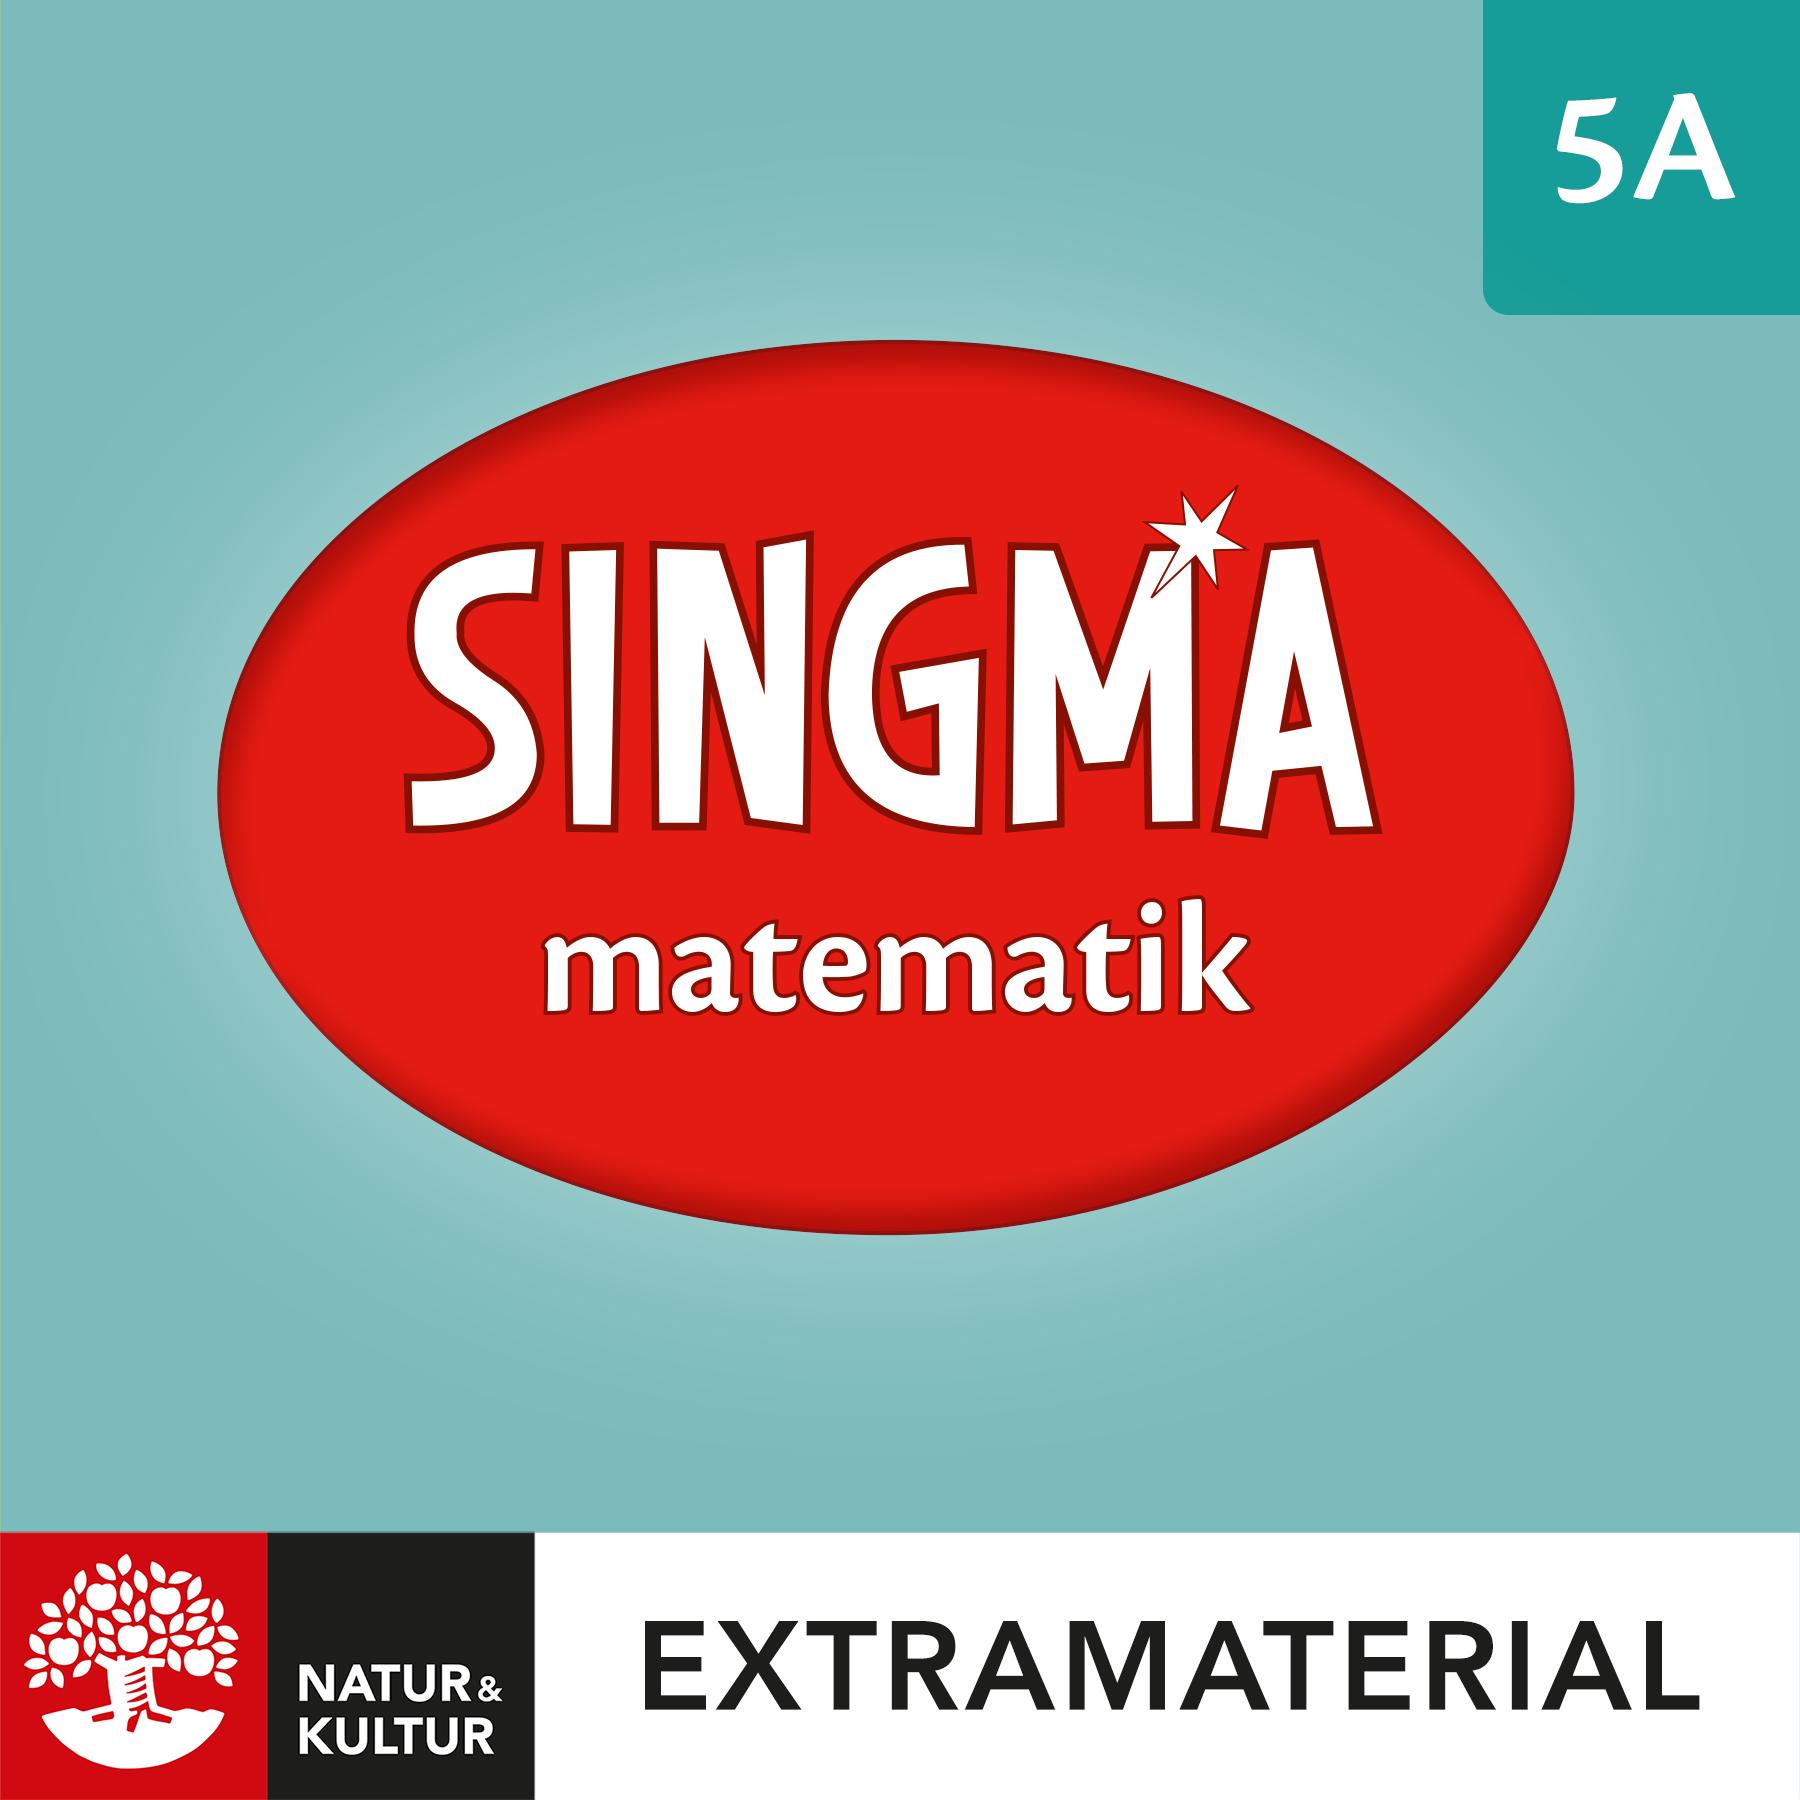 Singma matematik 5A